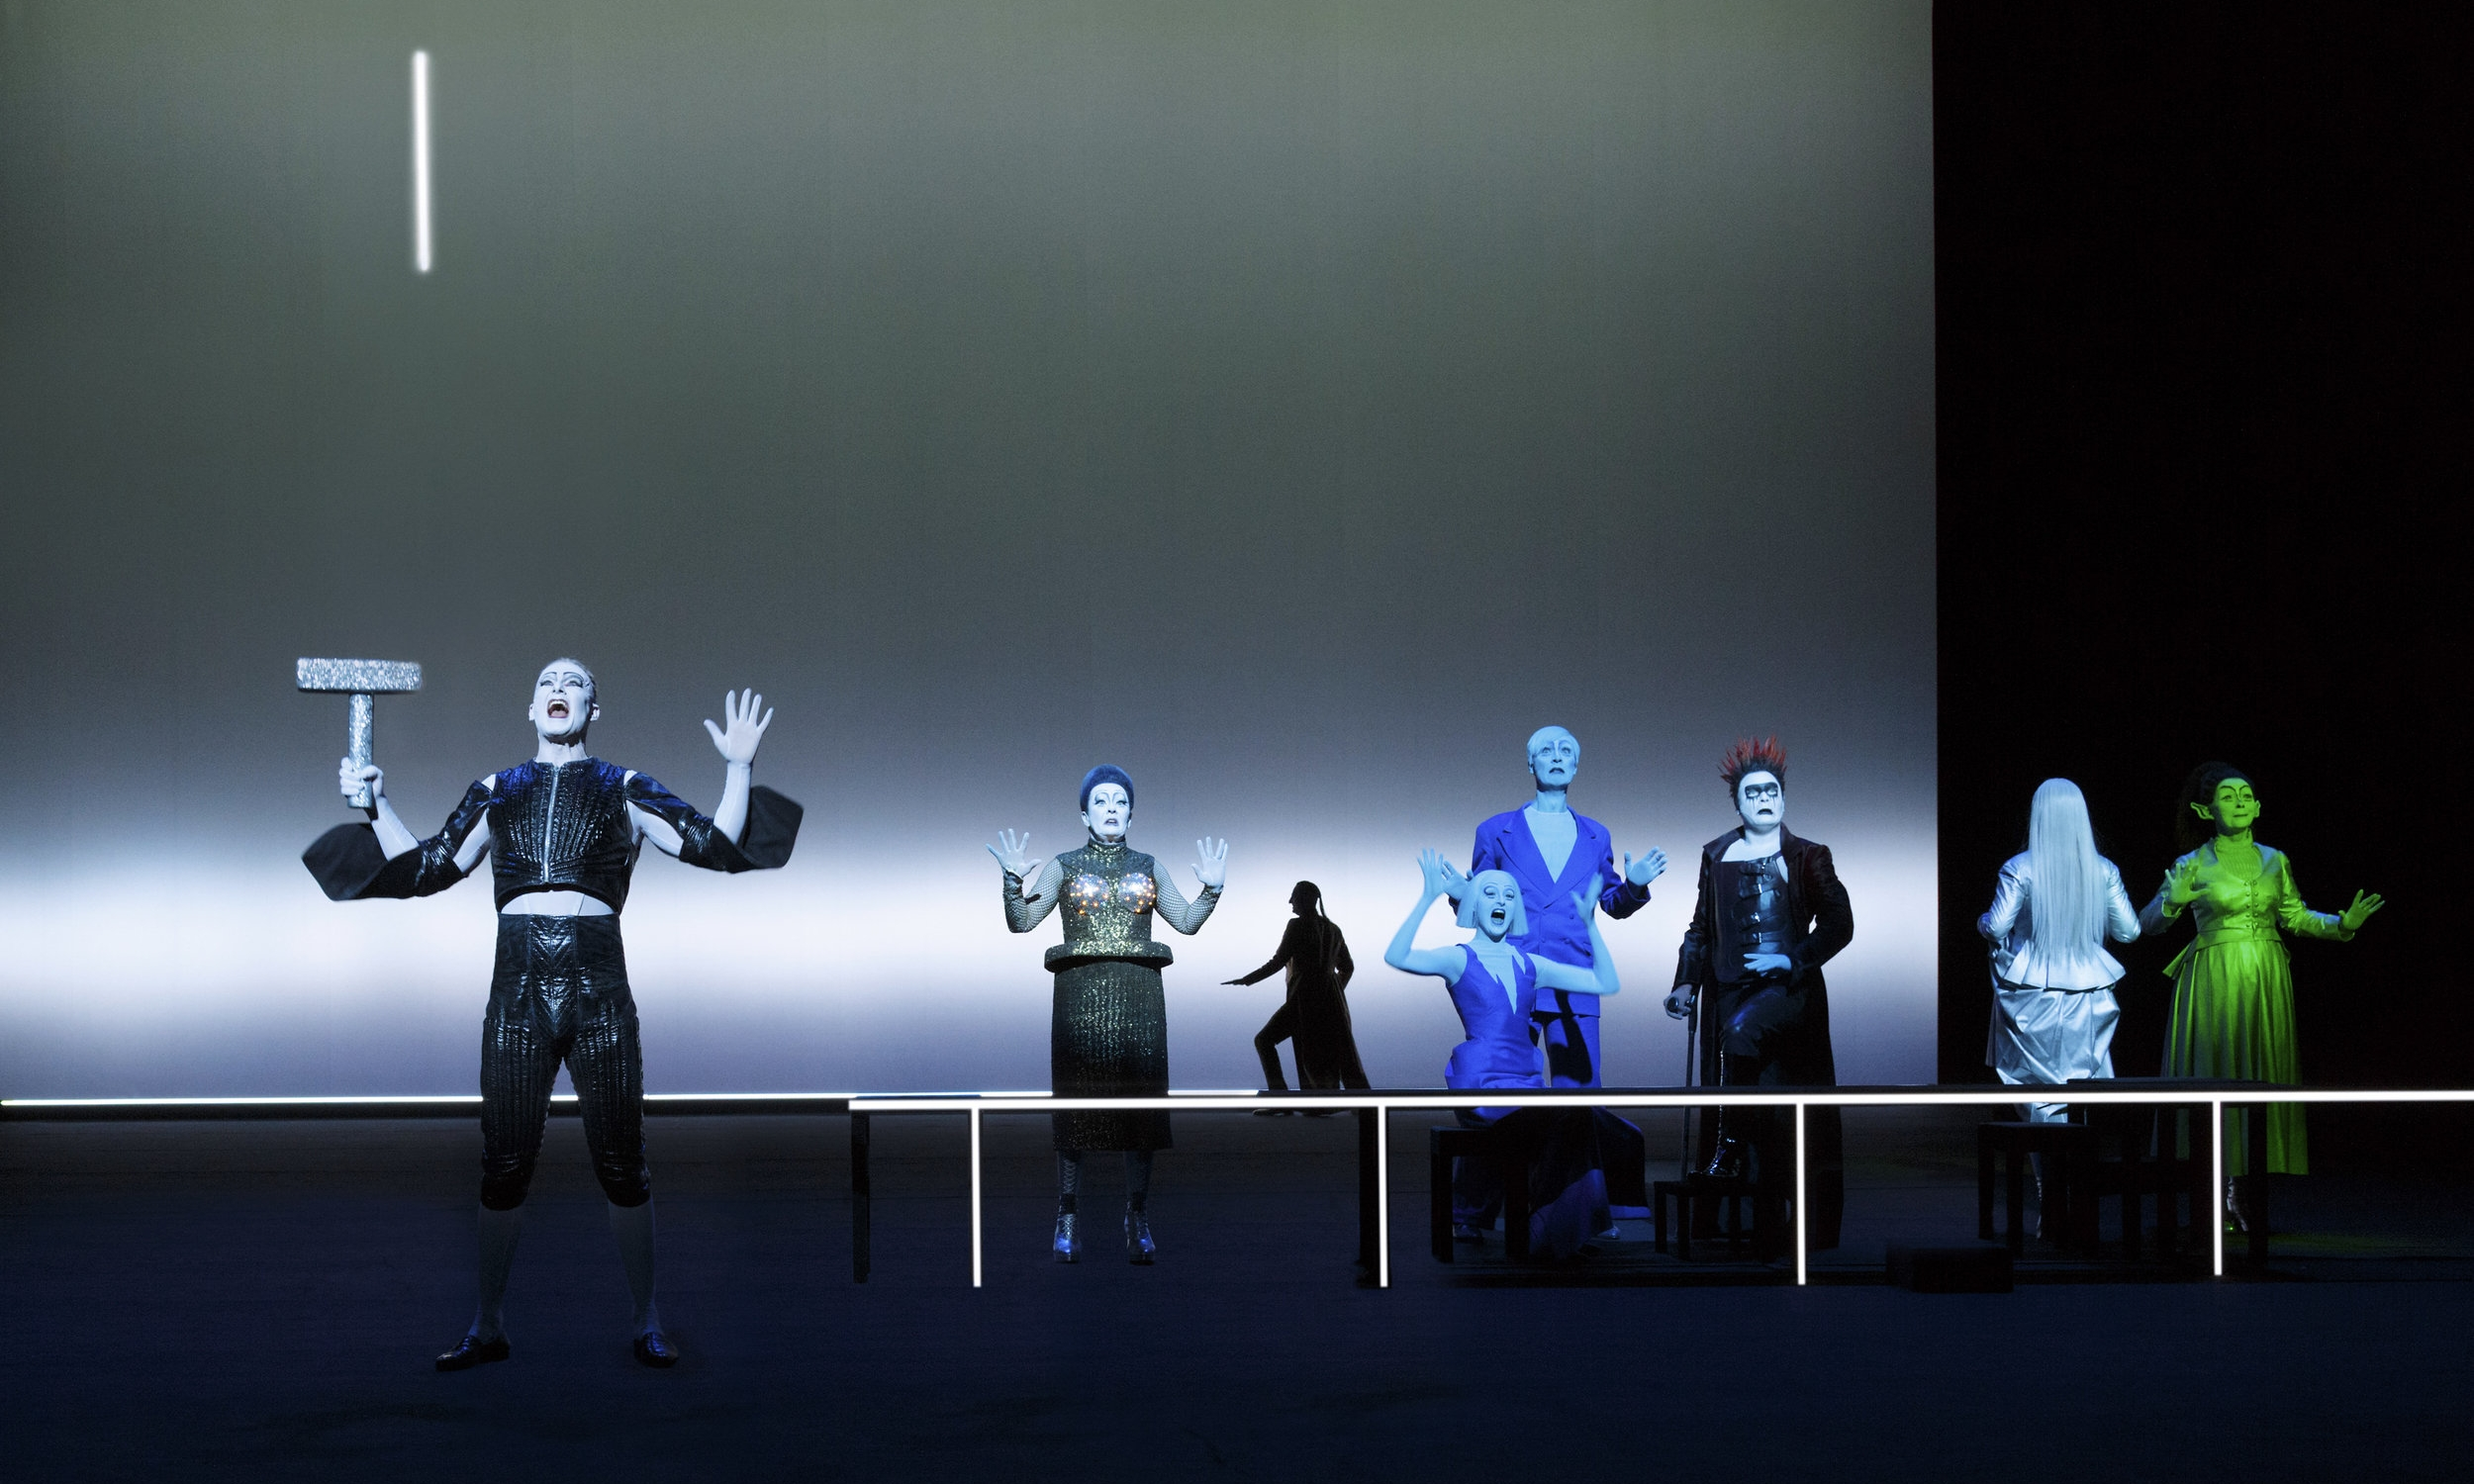 Scene 1B1 - The Gods are drinking: F. Winther (Tor), M. Krogh (Frigg), J. Rafaelsen (Ty), R. Reinsve (Frøya), O.G. Furuseth (Frøy), E. Nilsen Salthe (Loke), G. Jynge (Volva), U.V. Hol (Dauingen)